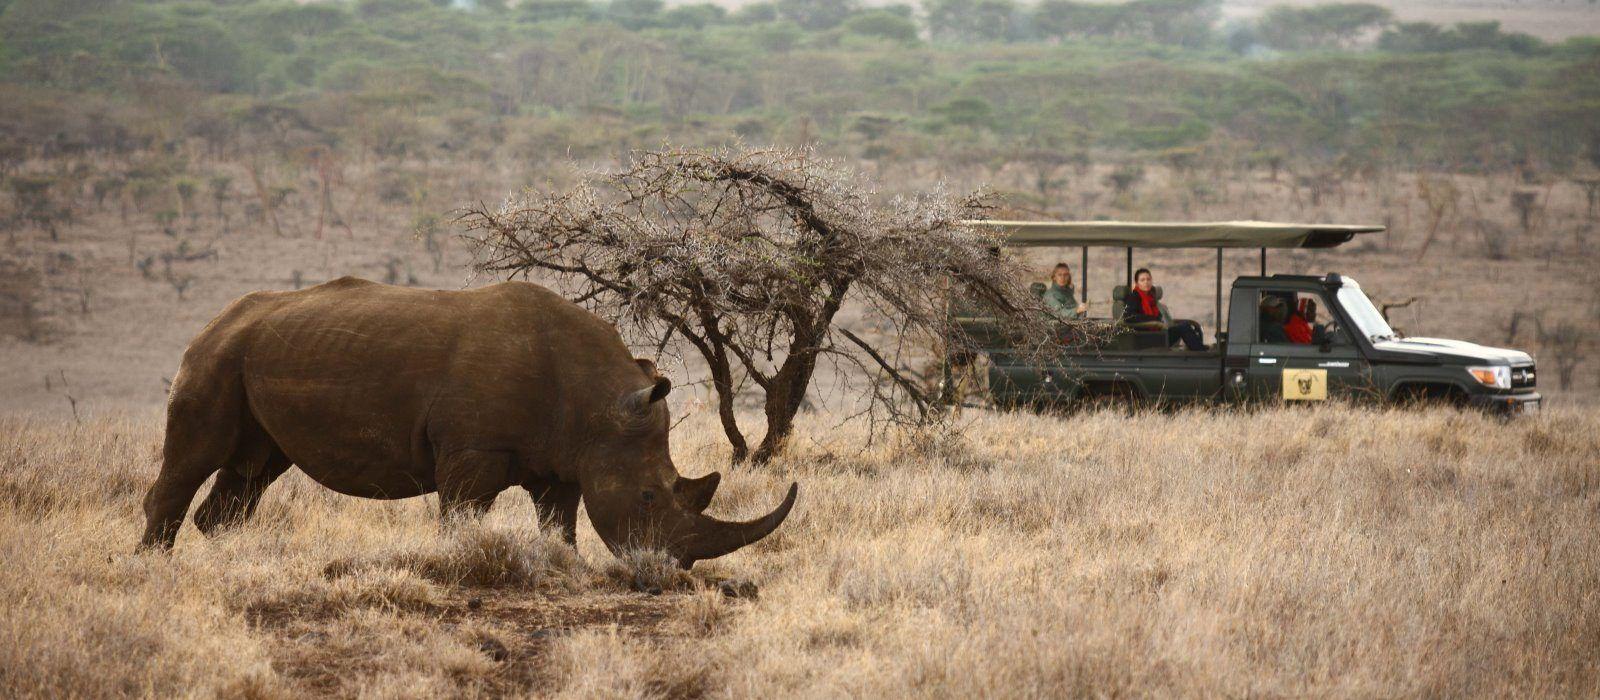 Kenia Hautnah: Safari Höhepunkte Urlaub 1